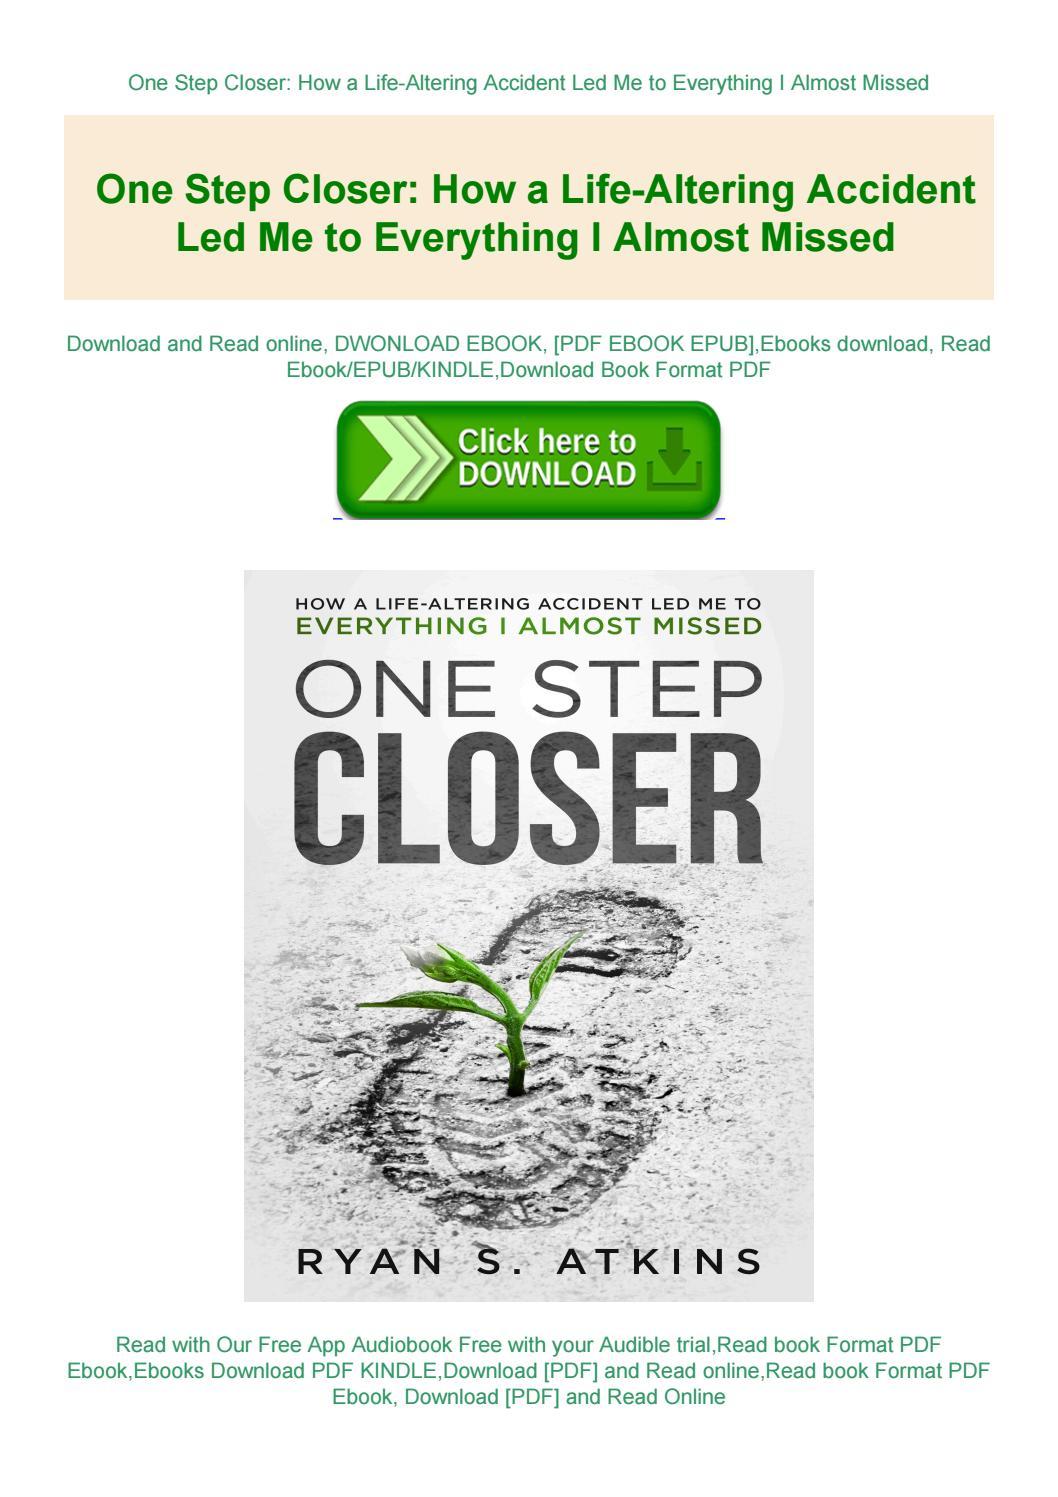 Step Closer PDF Free Download